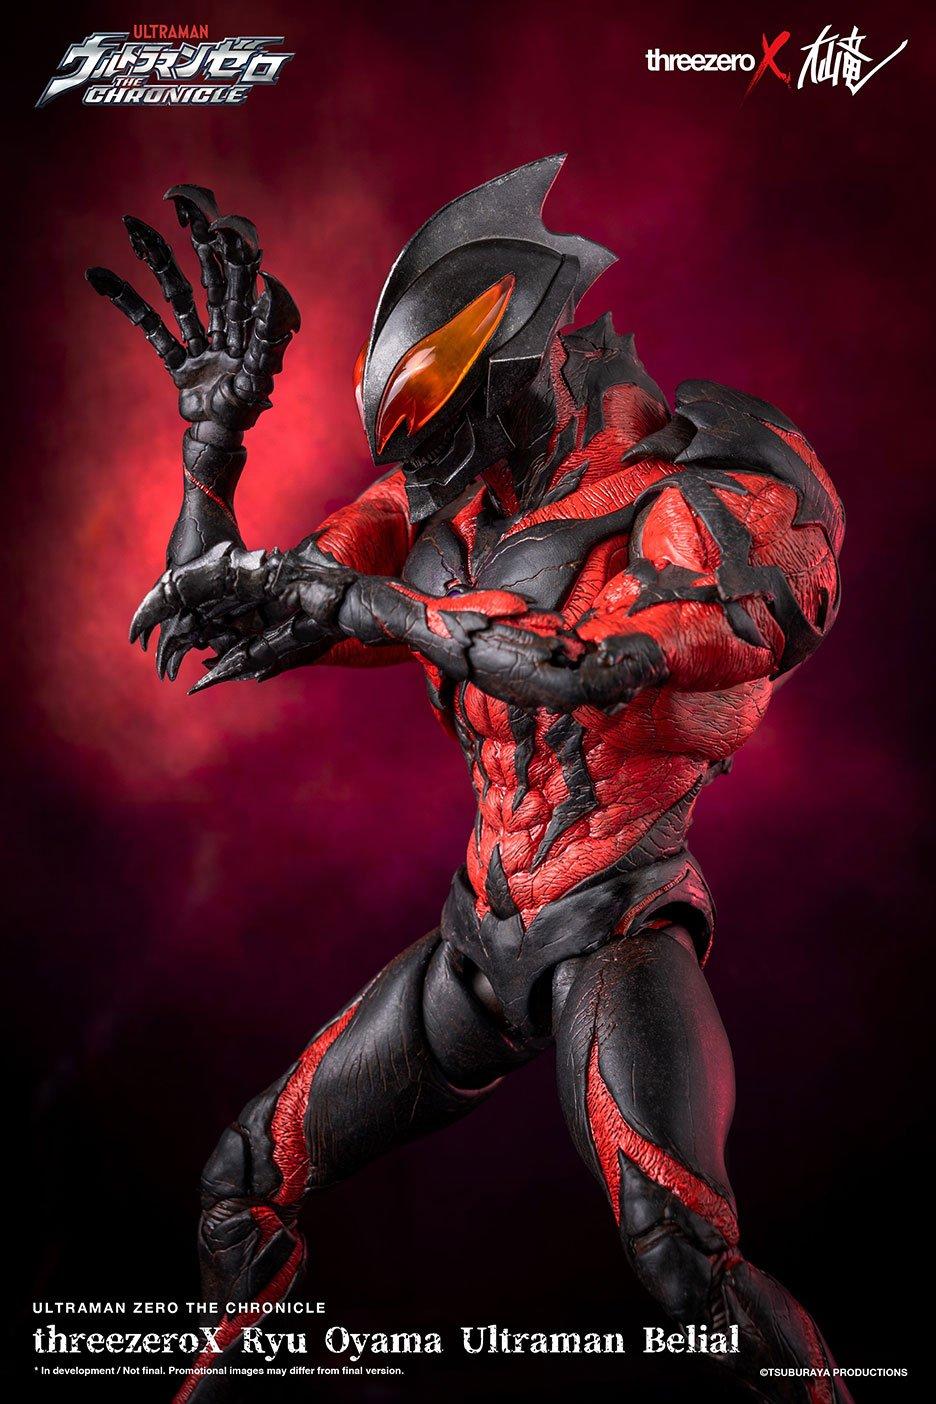 threezeroX-Ryu-Oyama-Ultraman-Belial_withlogo_14.jpg